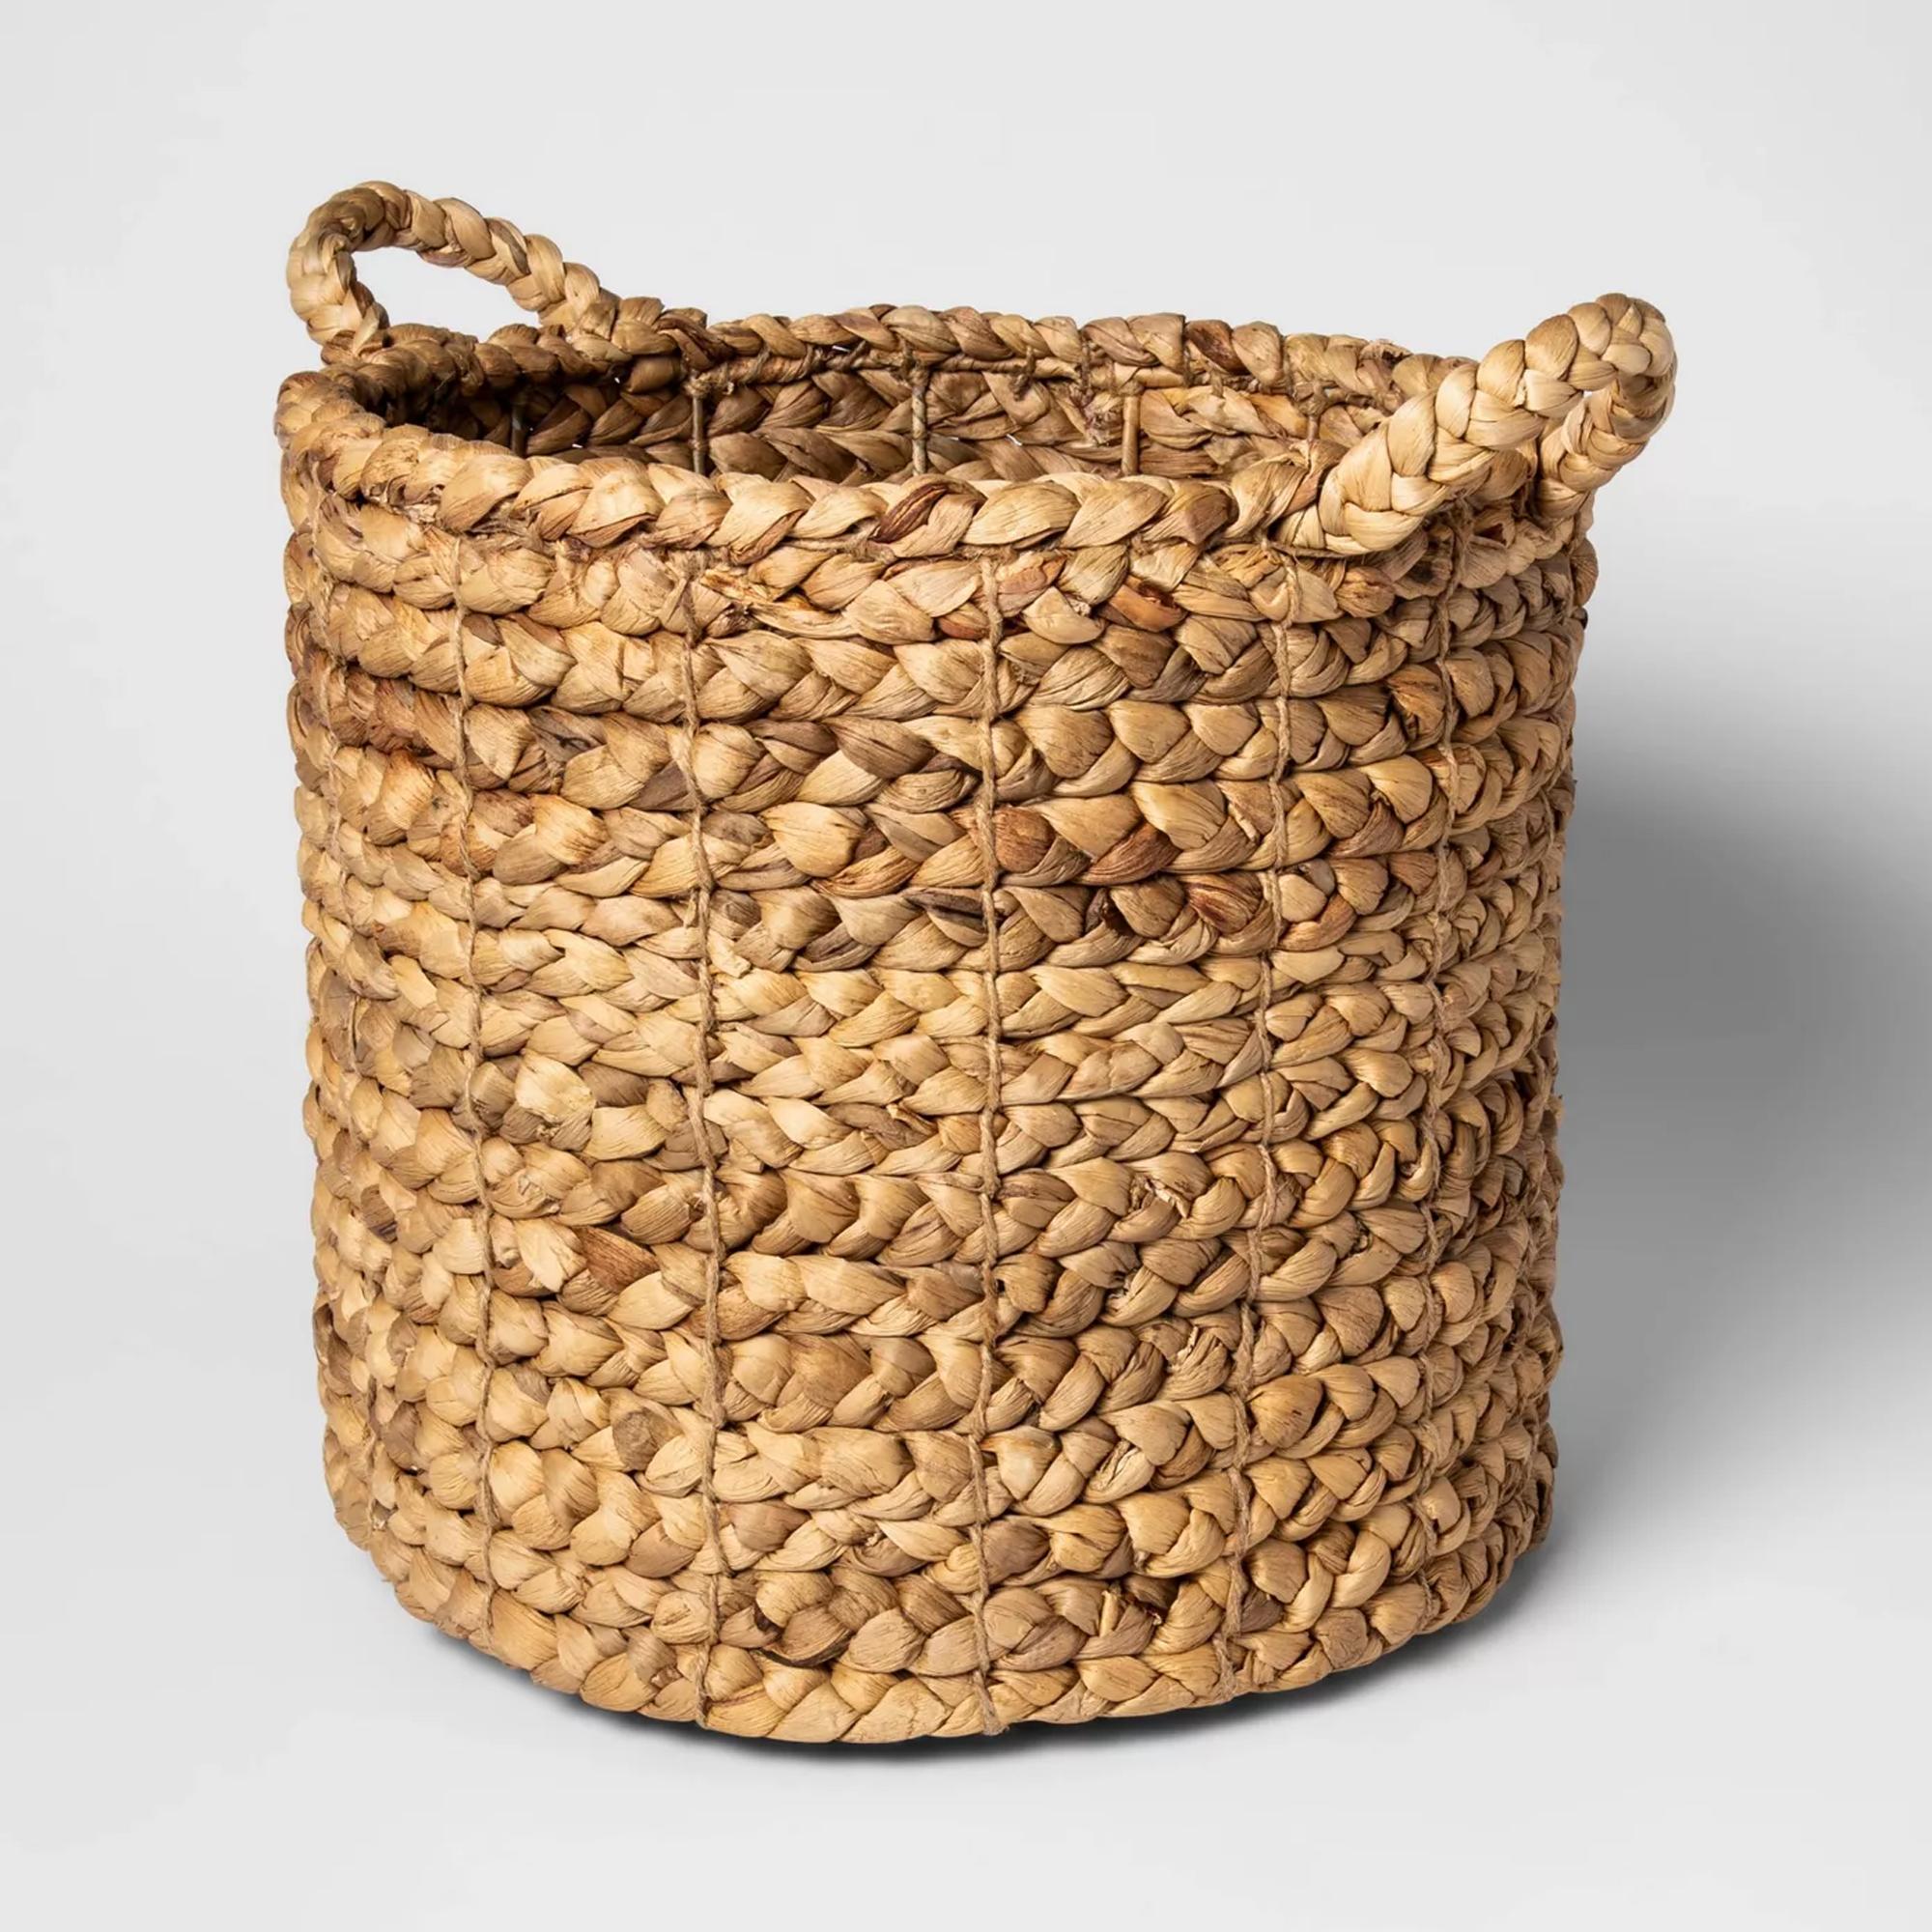 Copy of Woven Basket